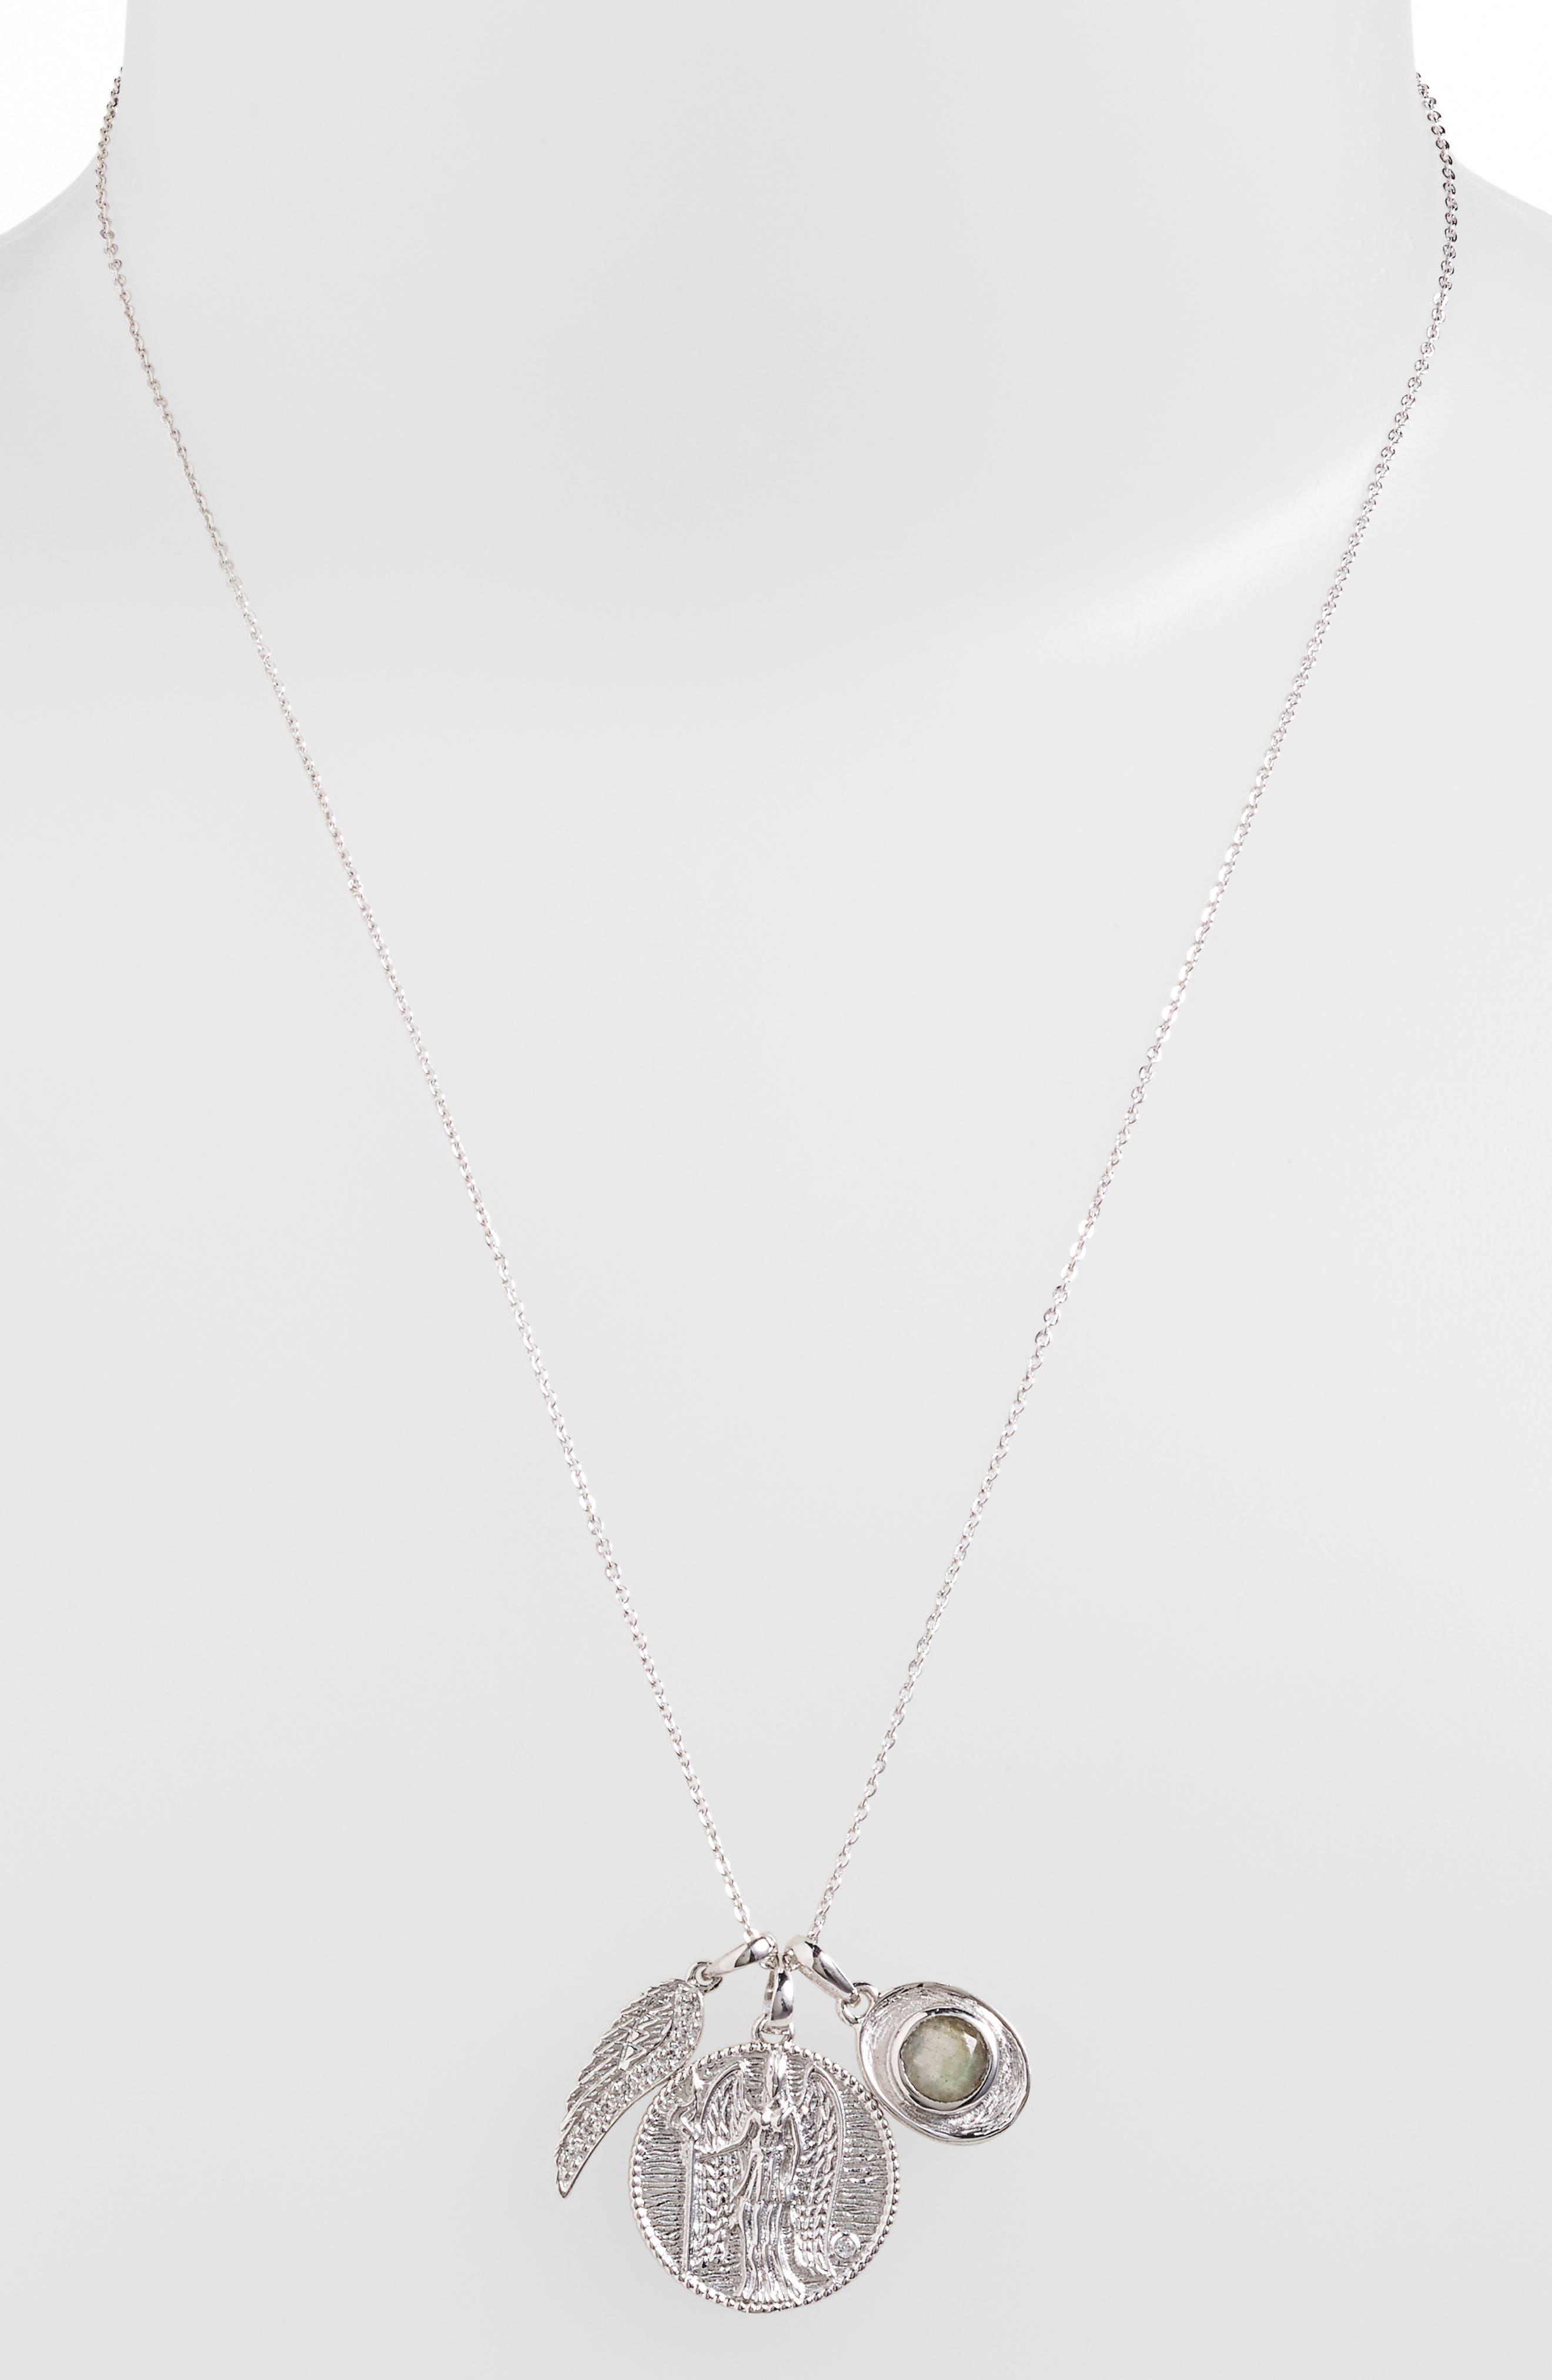 MELINDA MARIA Goddess of Power Pendant Necklace, Main, color, 040